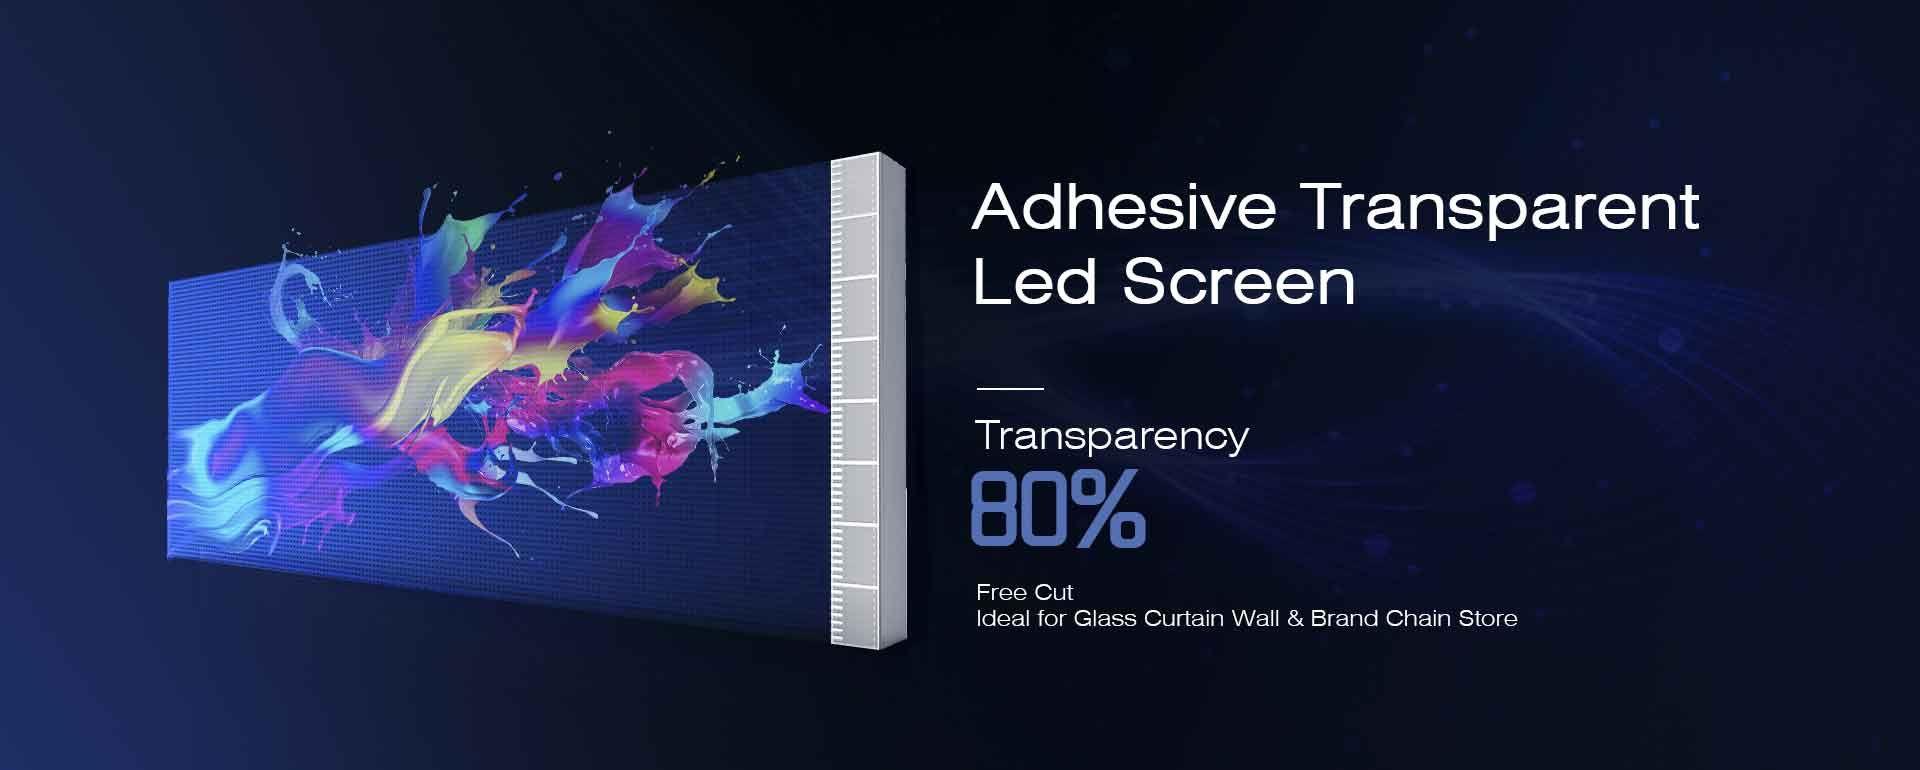 Adhesive Led Transparent Screen